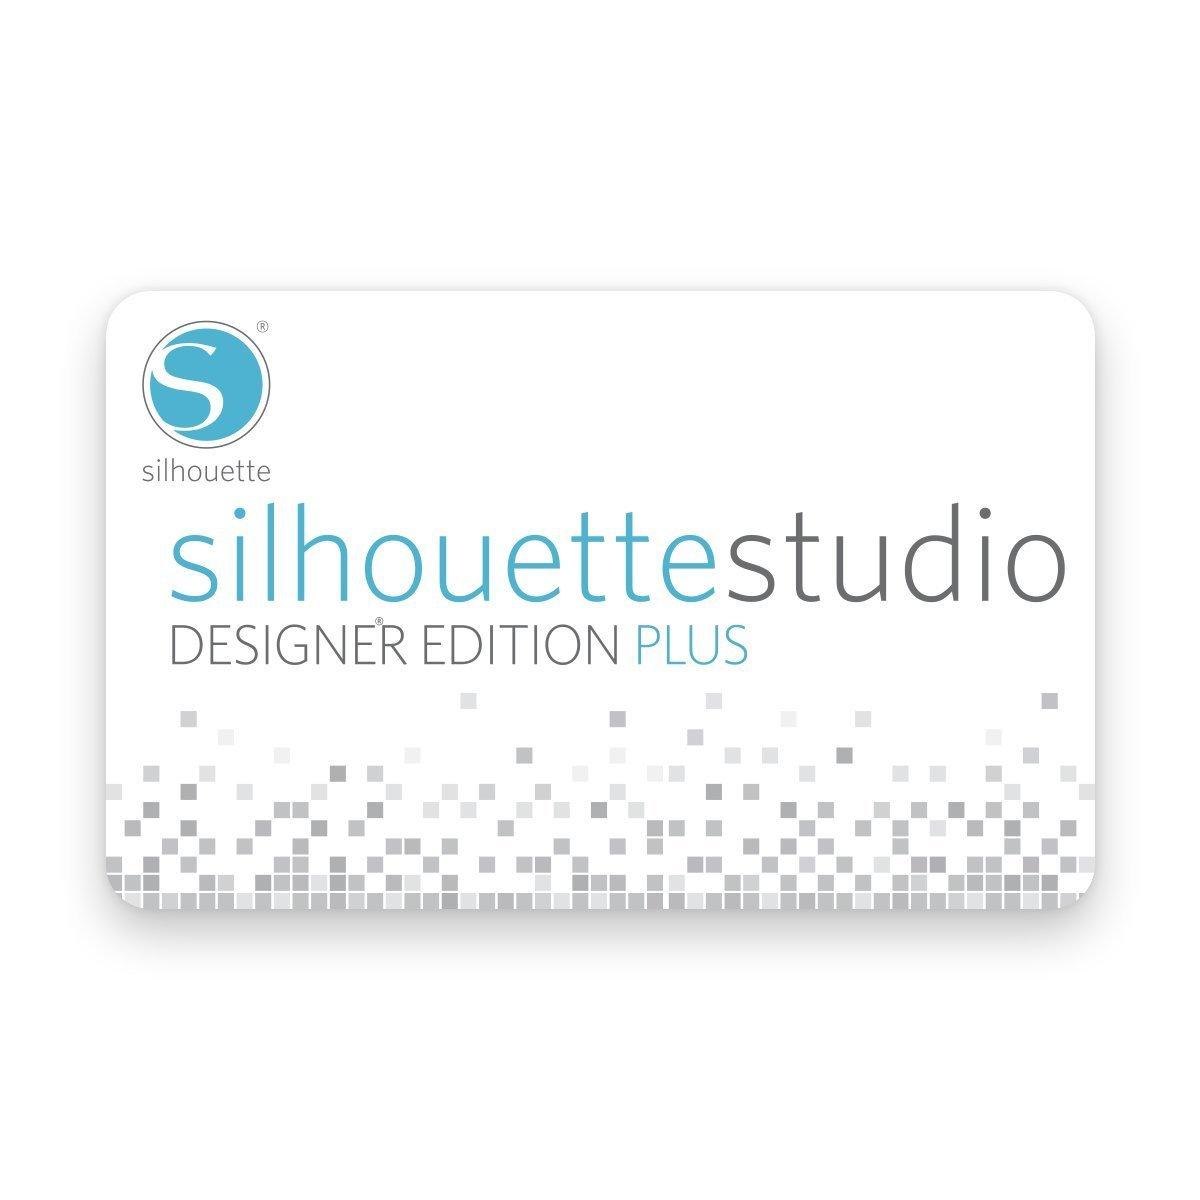 Silhouette studio designer edition vs standard business edition silhouette studio designer edition plus silhouette studio embroidery files silhouette studio applique files reheart Image collections